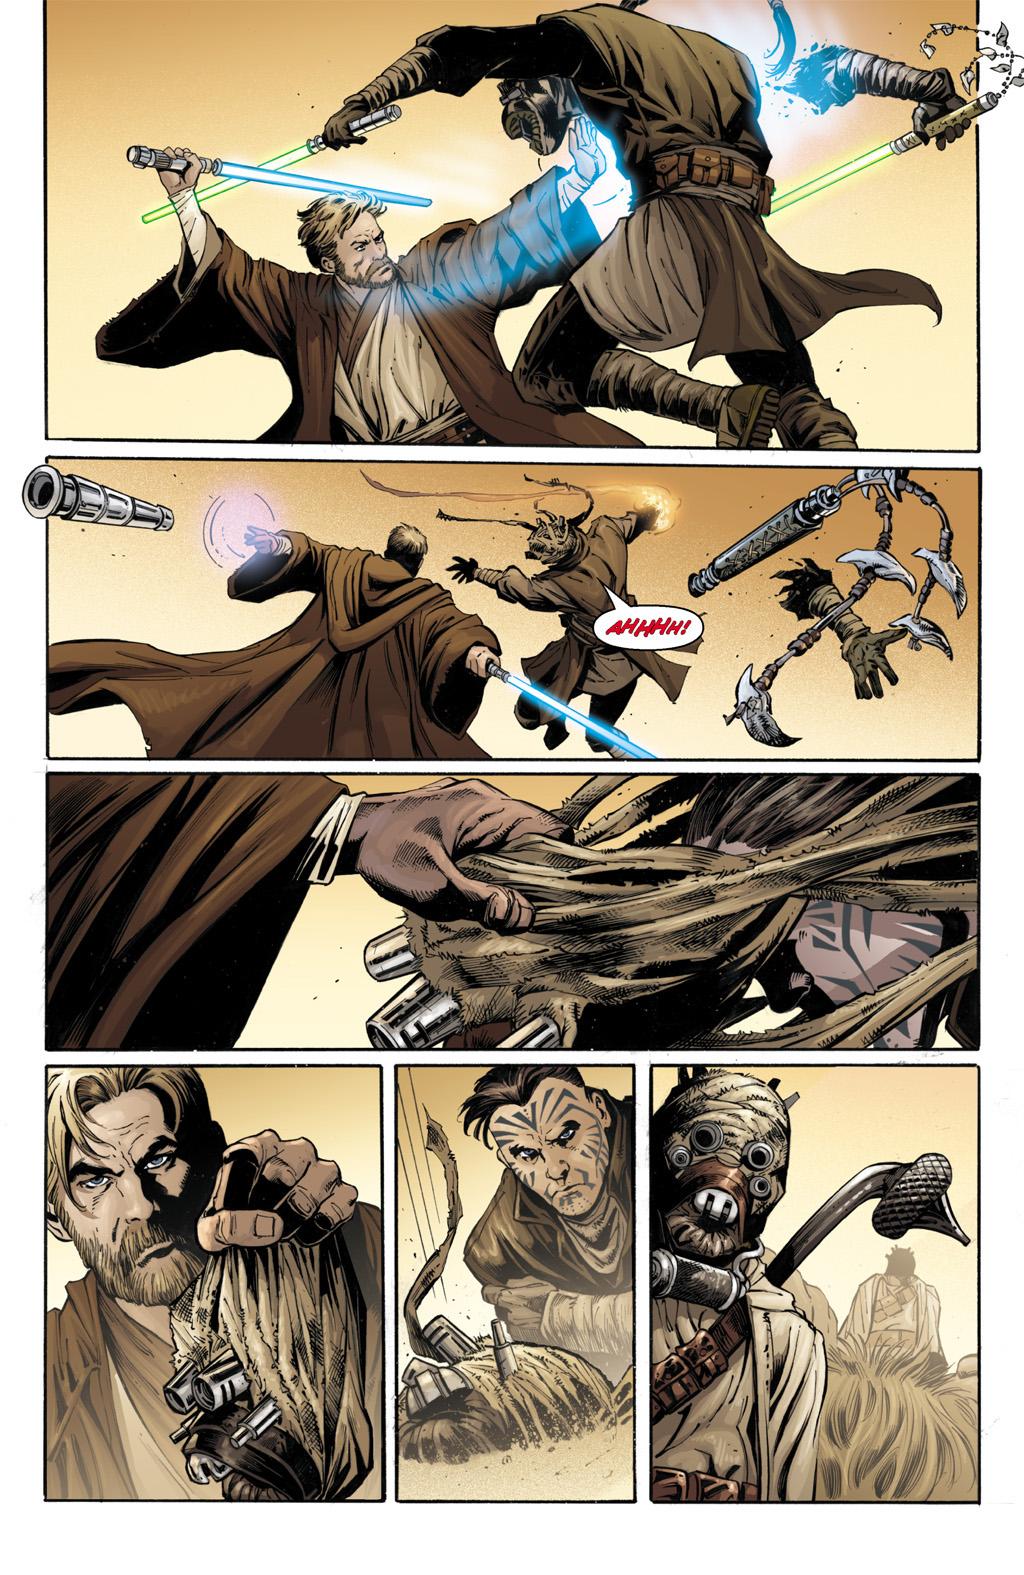 Comic-Only Fights Adapted To Novel Format TrucZSmNlSeHezFfByjir_kaZ7jY3Dncc3SFMLc6W7m6W_iCO1hKsqS48XMNLGppDrzPuPdgNc8=s1600